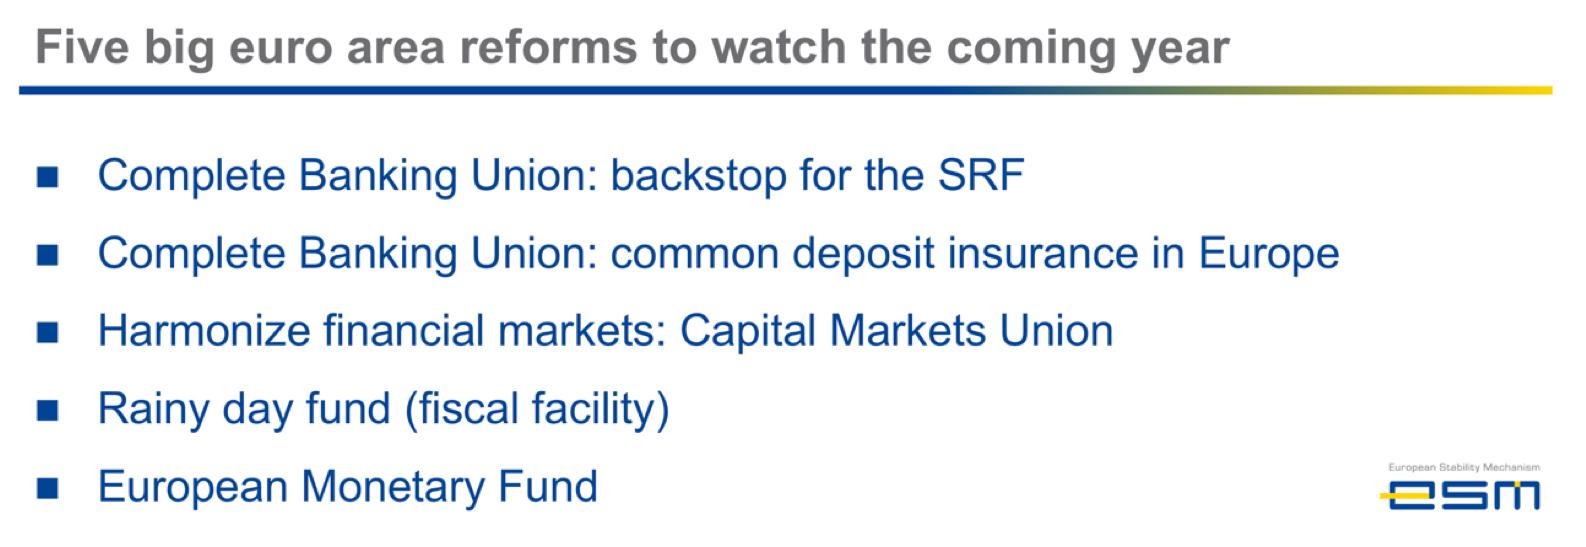 five-big-euro-area